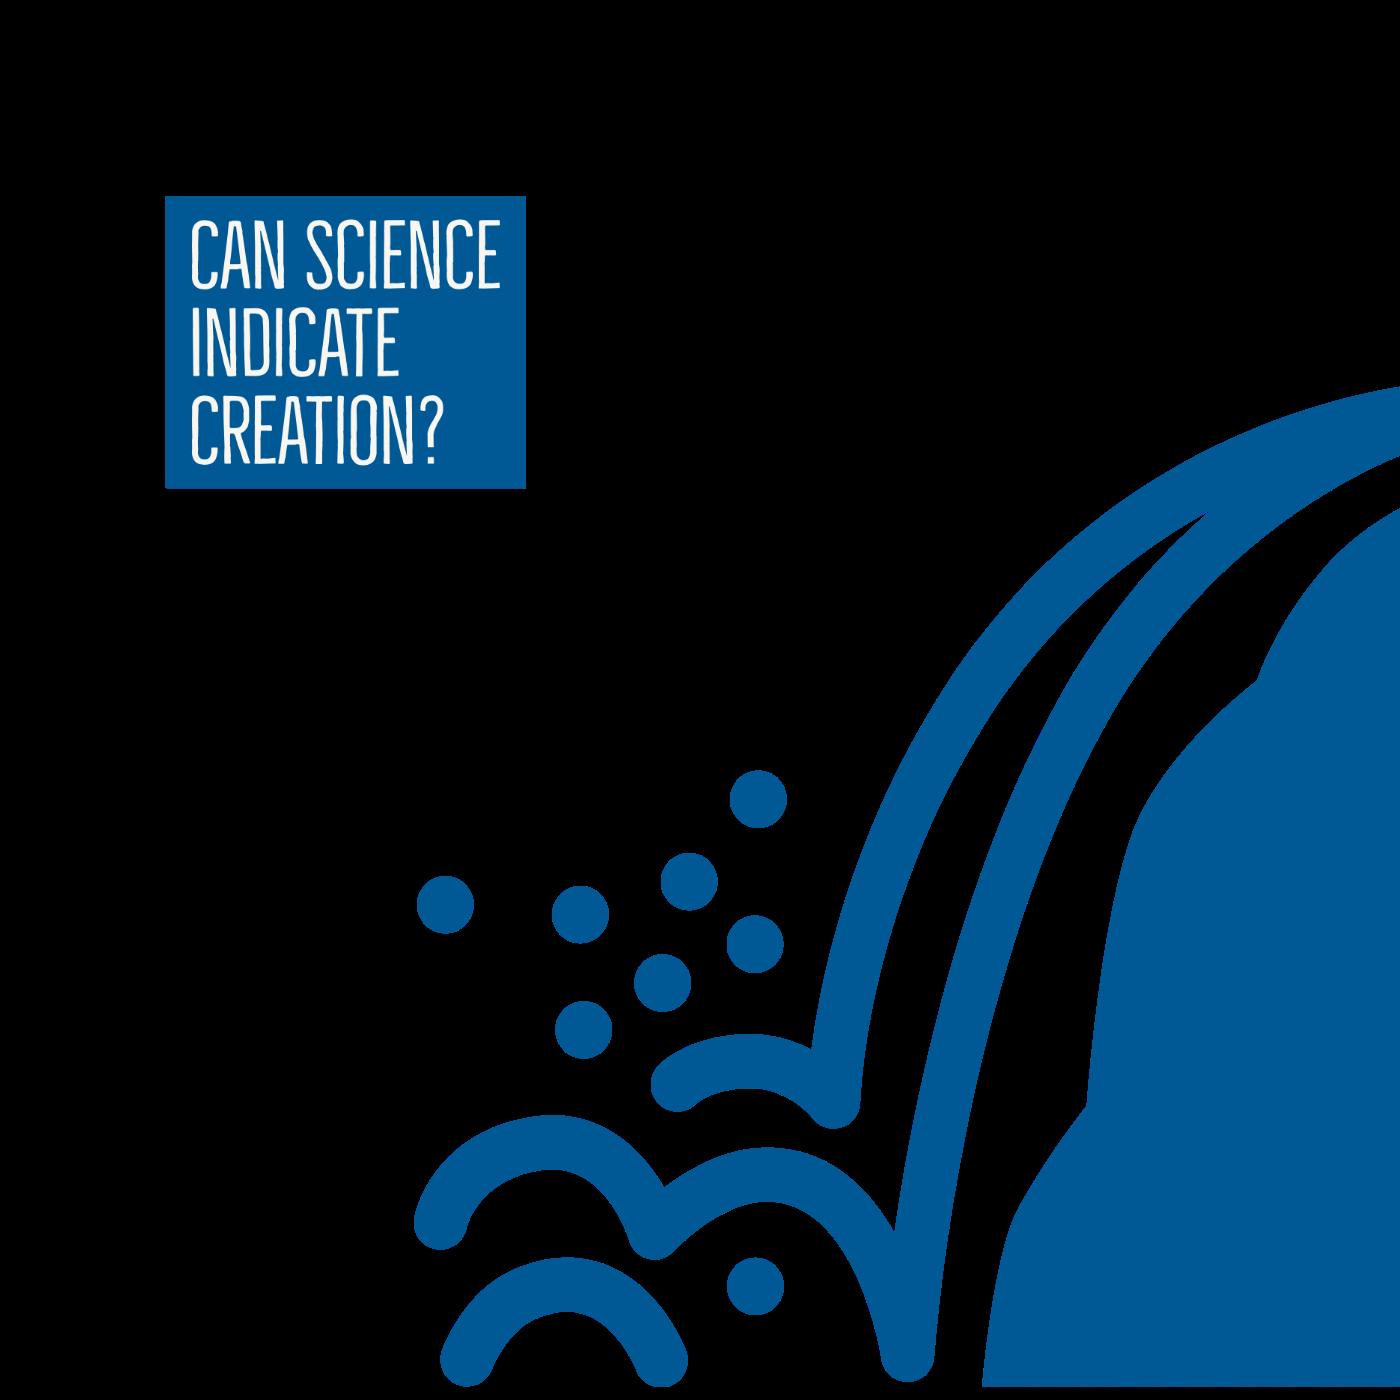 Science-creation-god